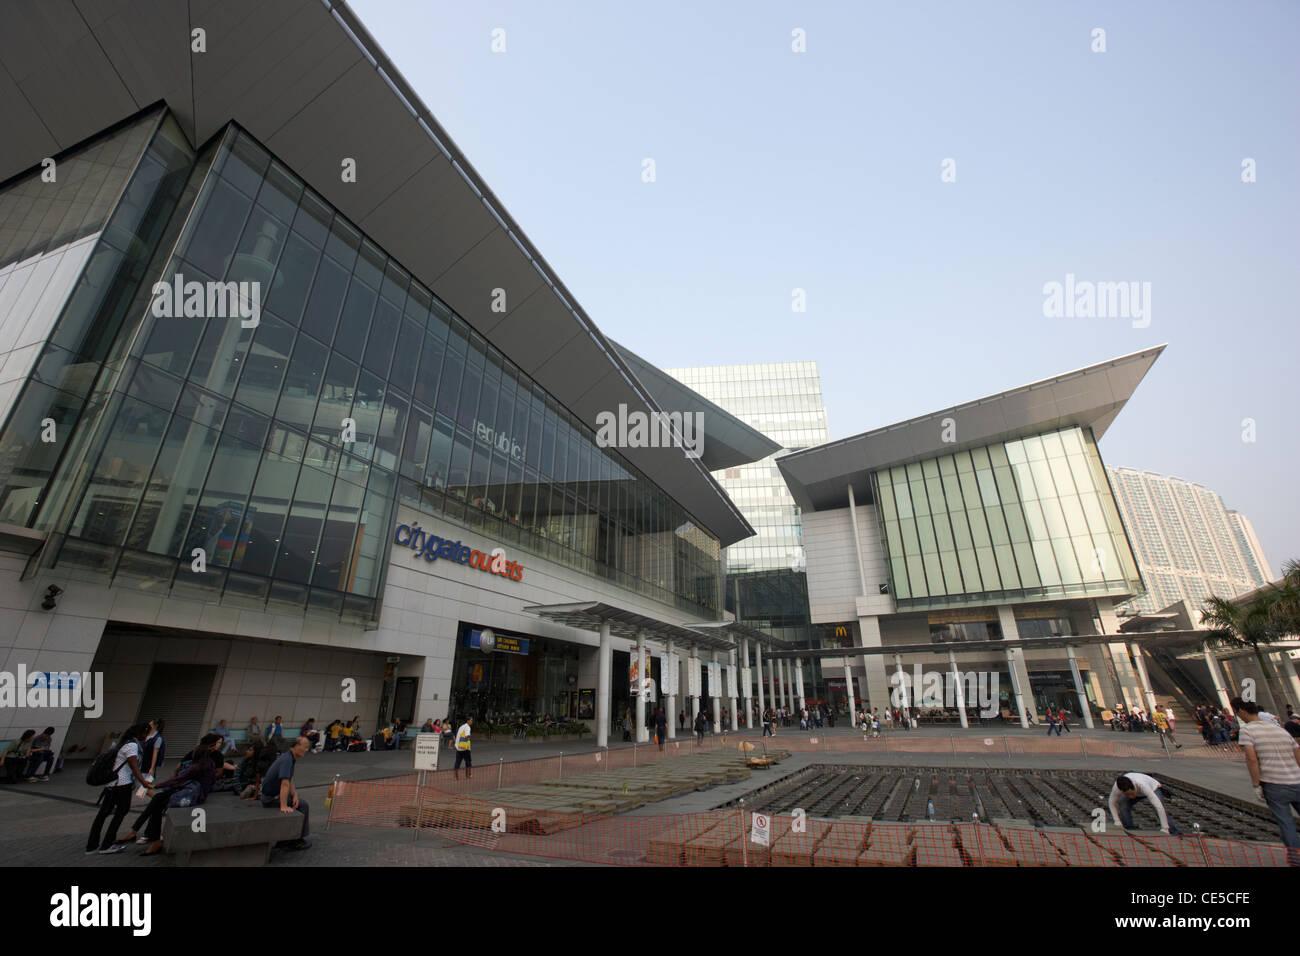 citygate outlets tung chung lantau island hong kong hksar china asia - Stock Image